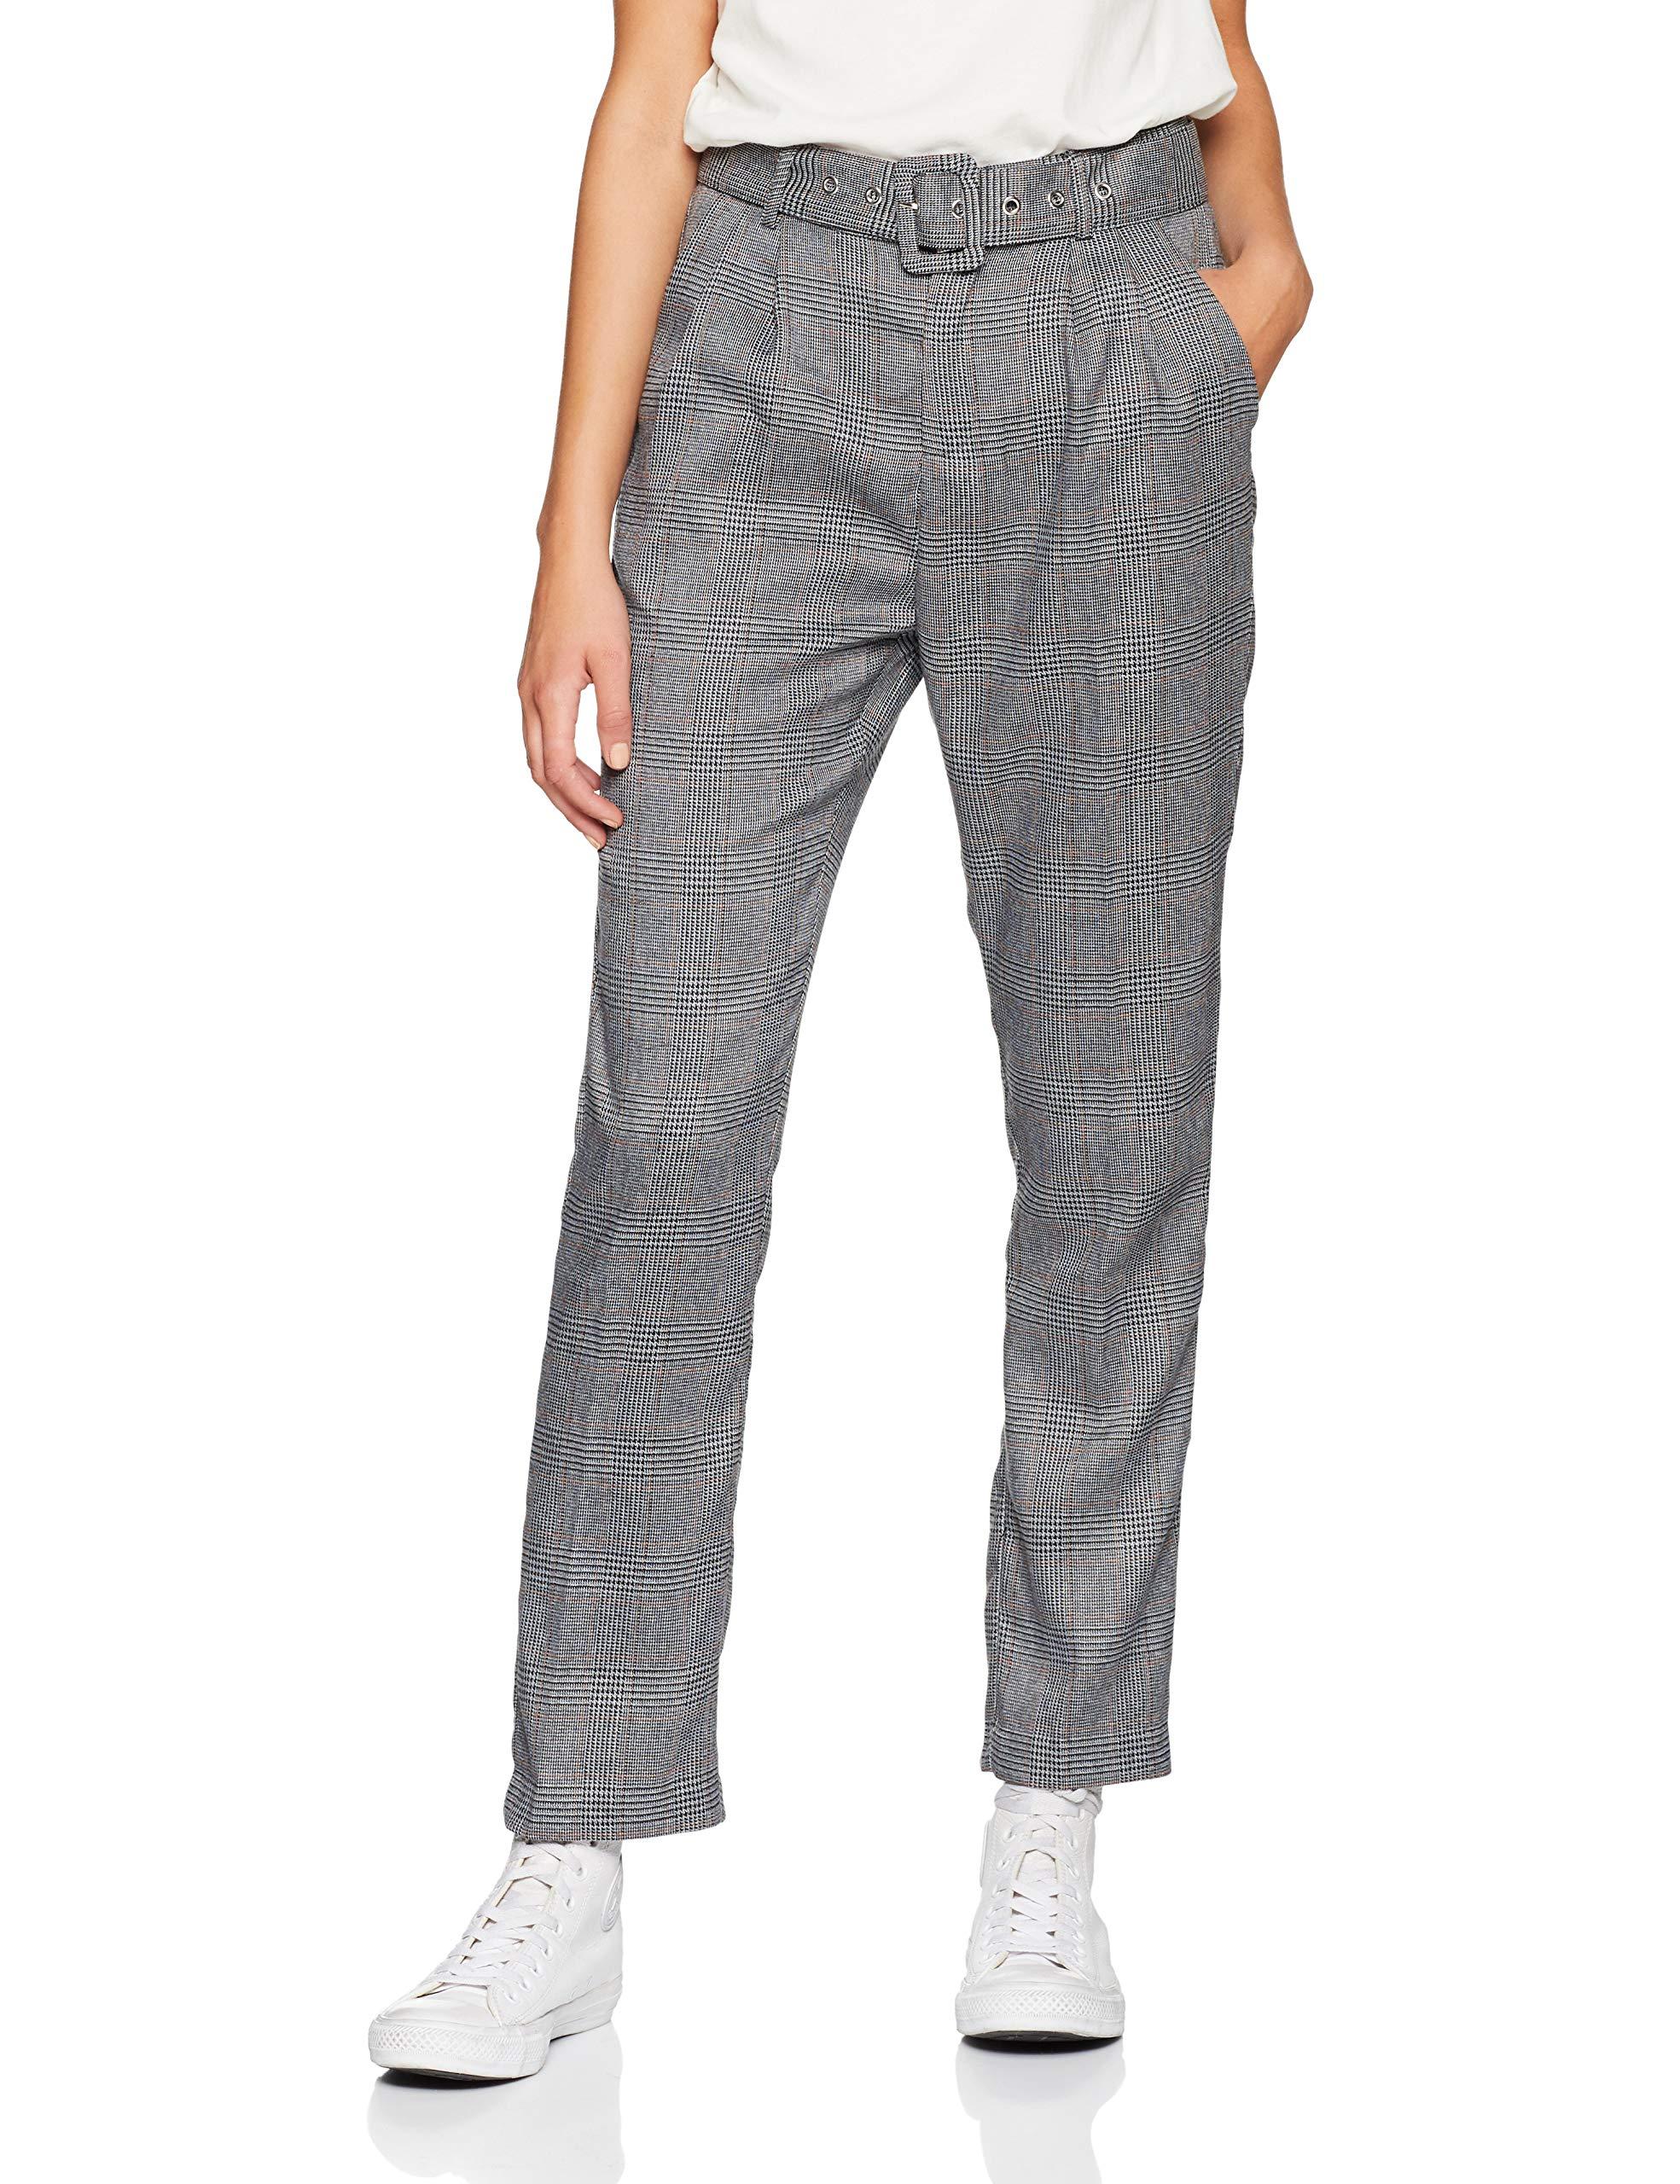 Rinda Femme Sparkz Tailleur Pants pantalonGreyasphalt 06438 rCBxoed